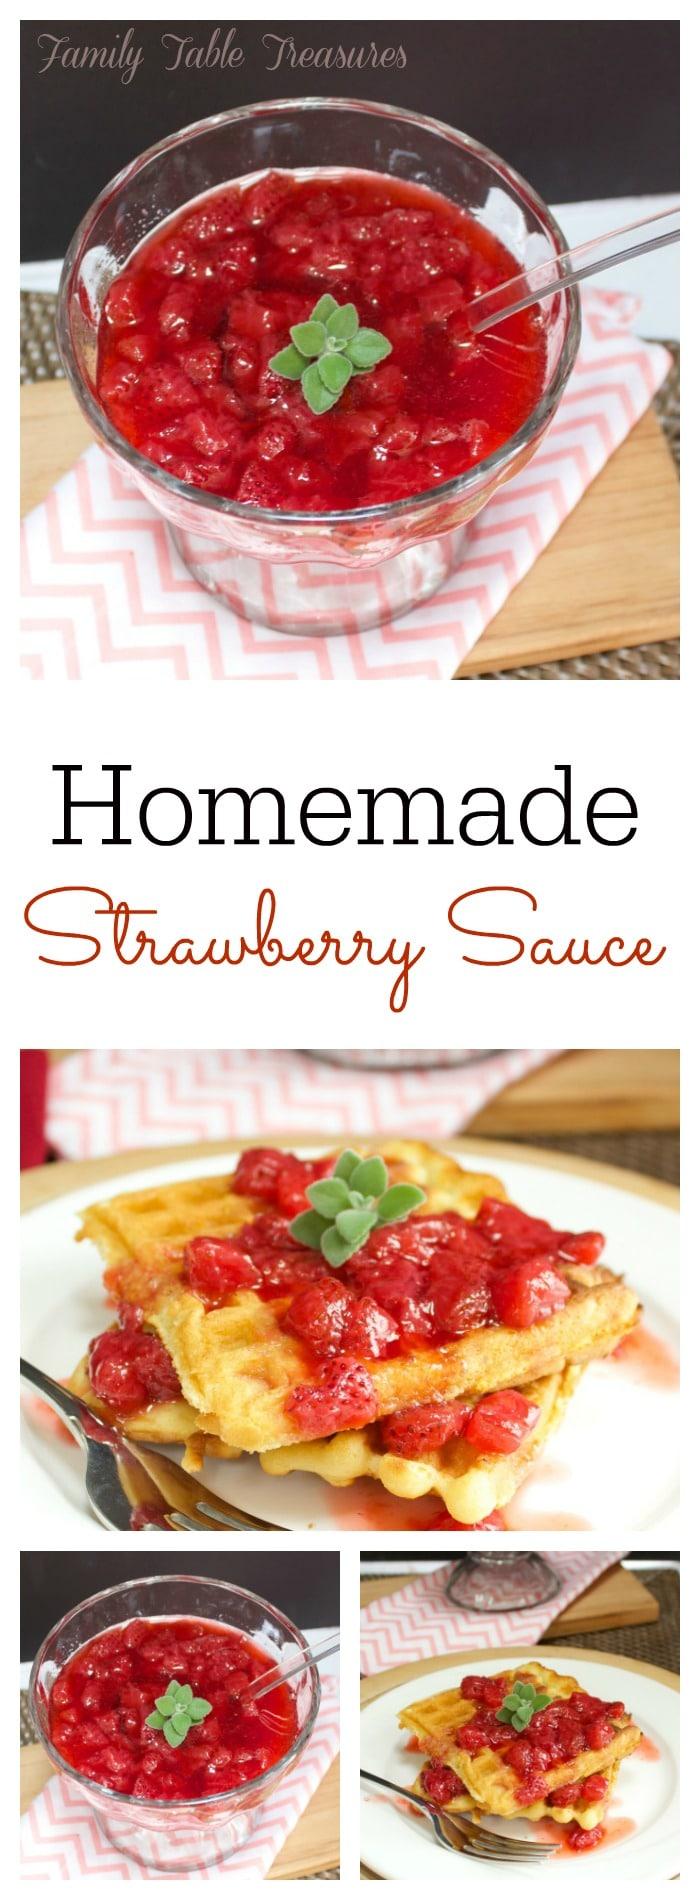 Homemade Strawberry Sauce